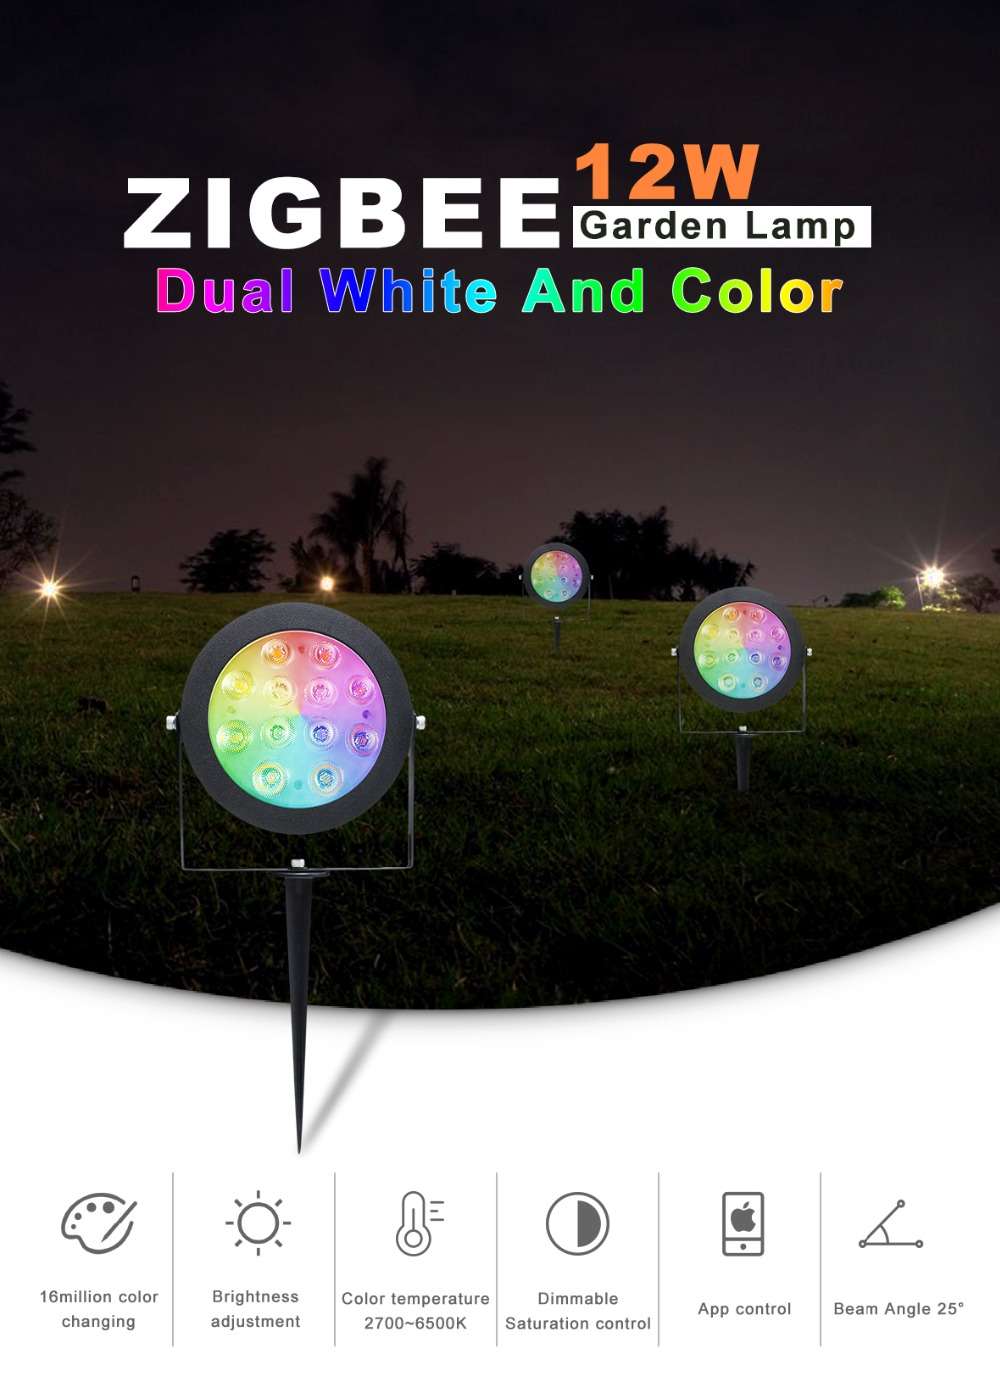 ZIGBEE light link LED garden lamp outdoor light ZLL 12W RGB CCT Lawn Lamp AC110 240V work with Amazon alexa echo phone app